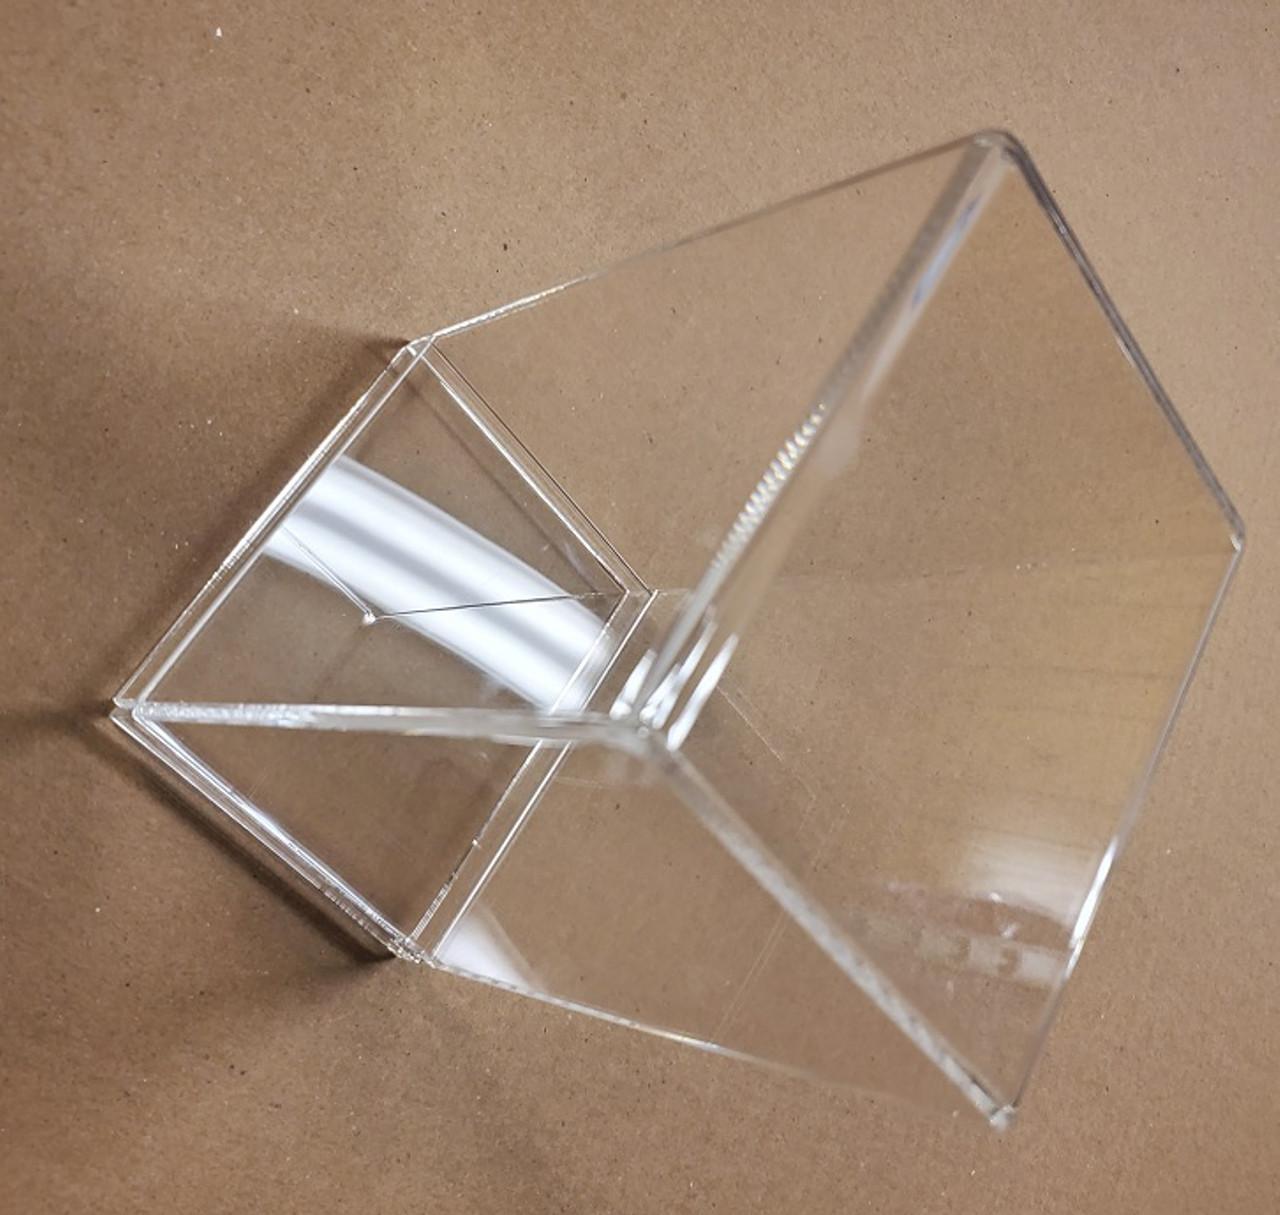 Crystal Clear Acrylic Funko Case